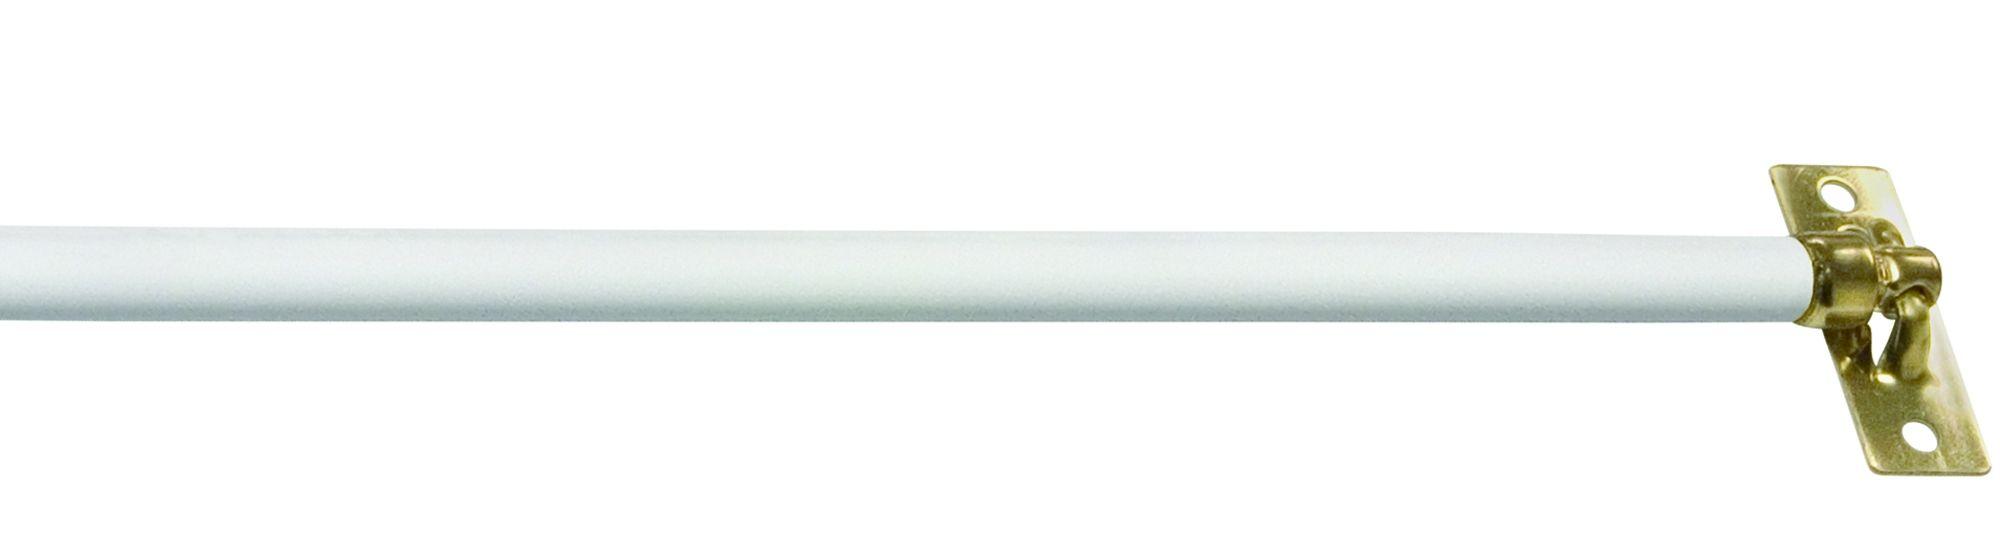 Kenney Mfg 5 16 Inch Swivel End White Sash Curtain Rod Curtain